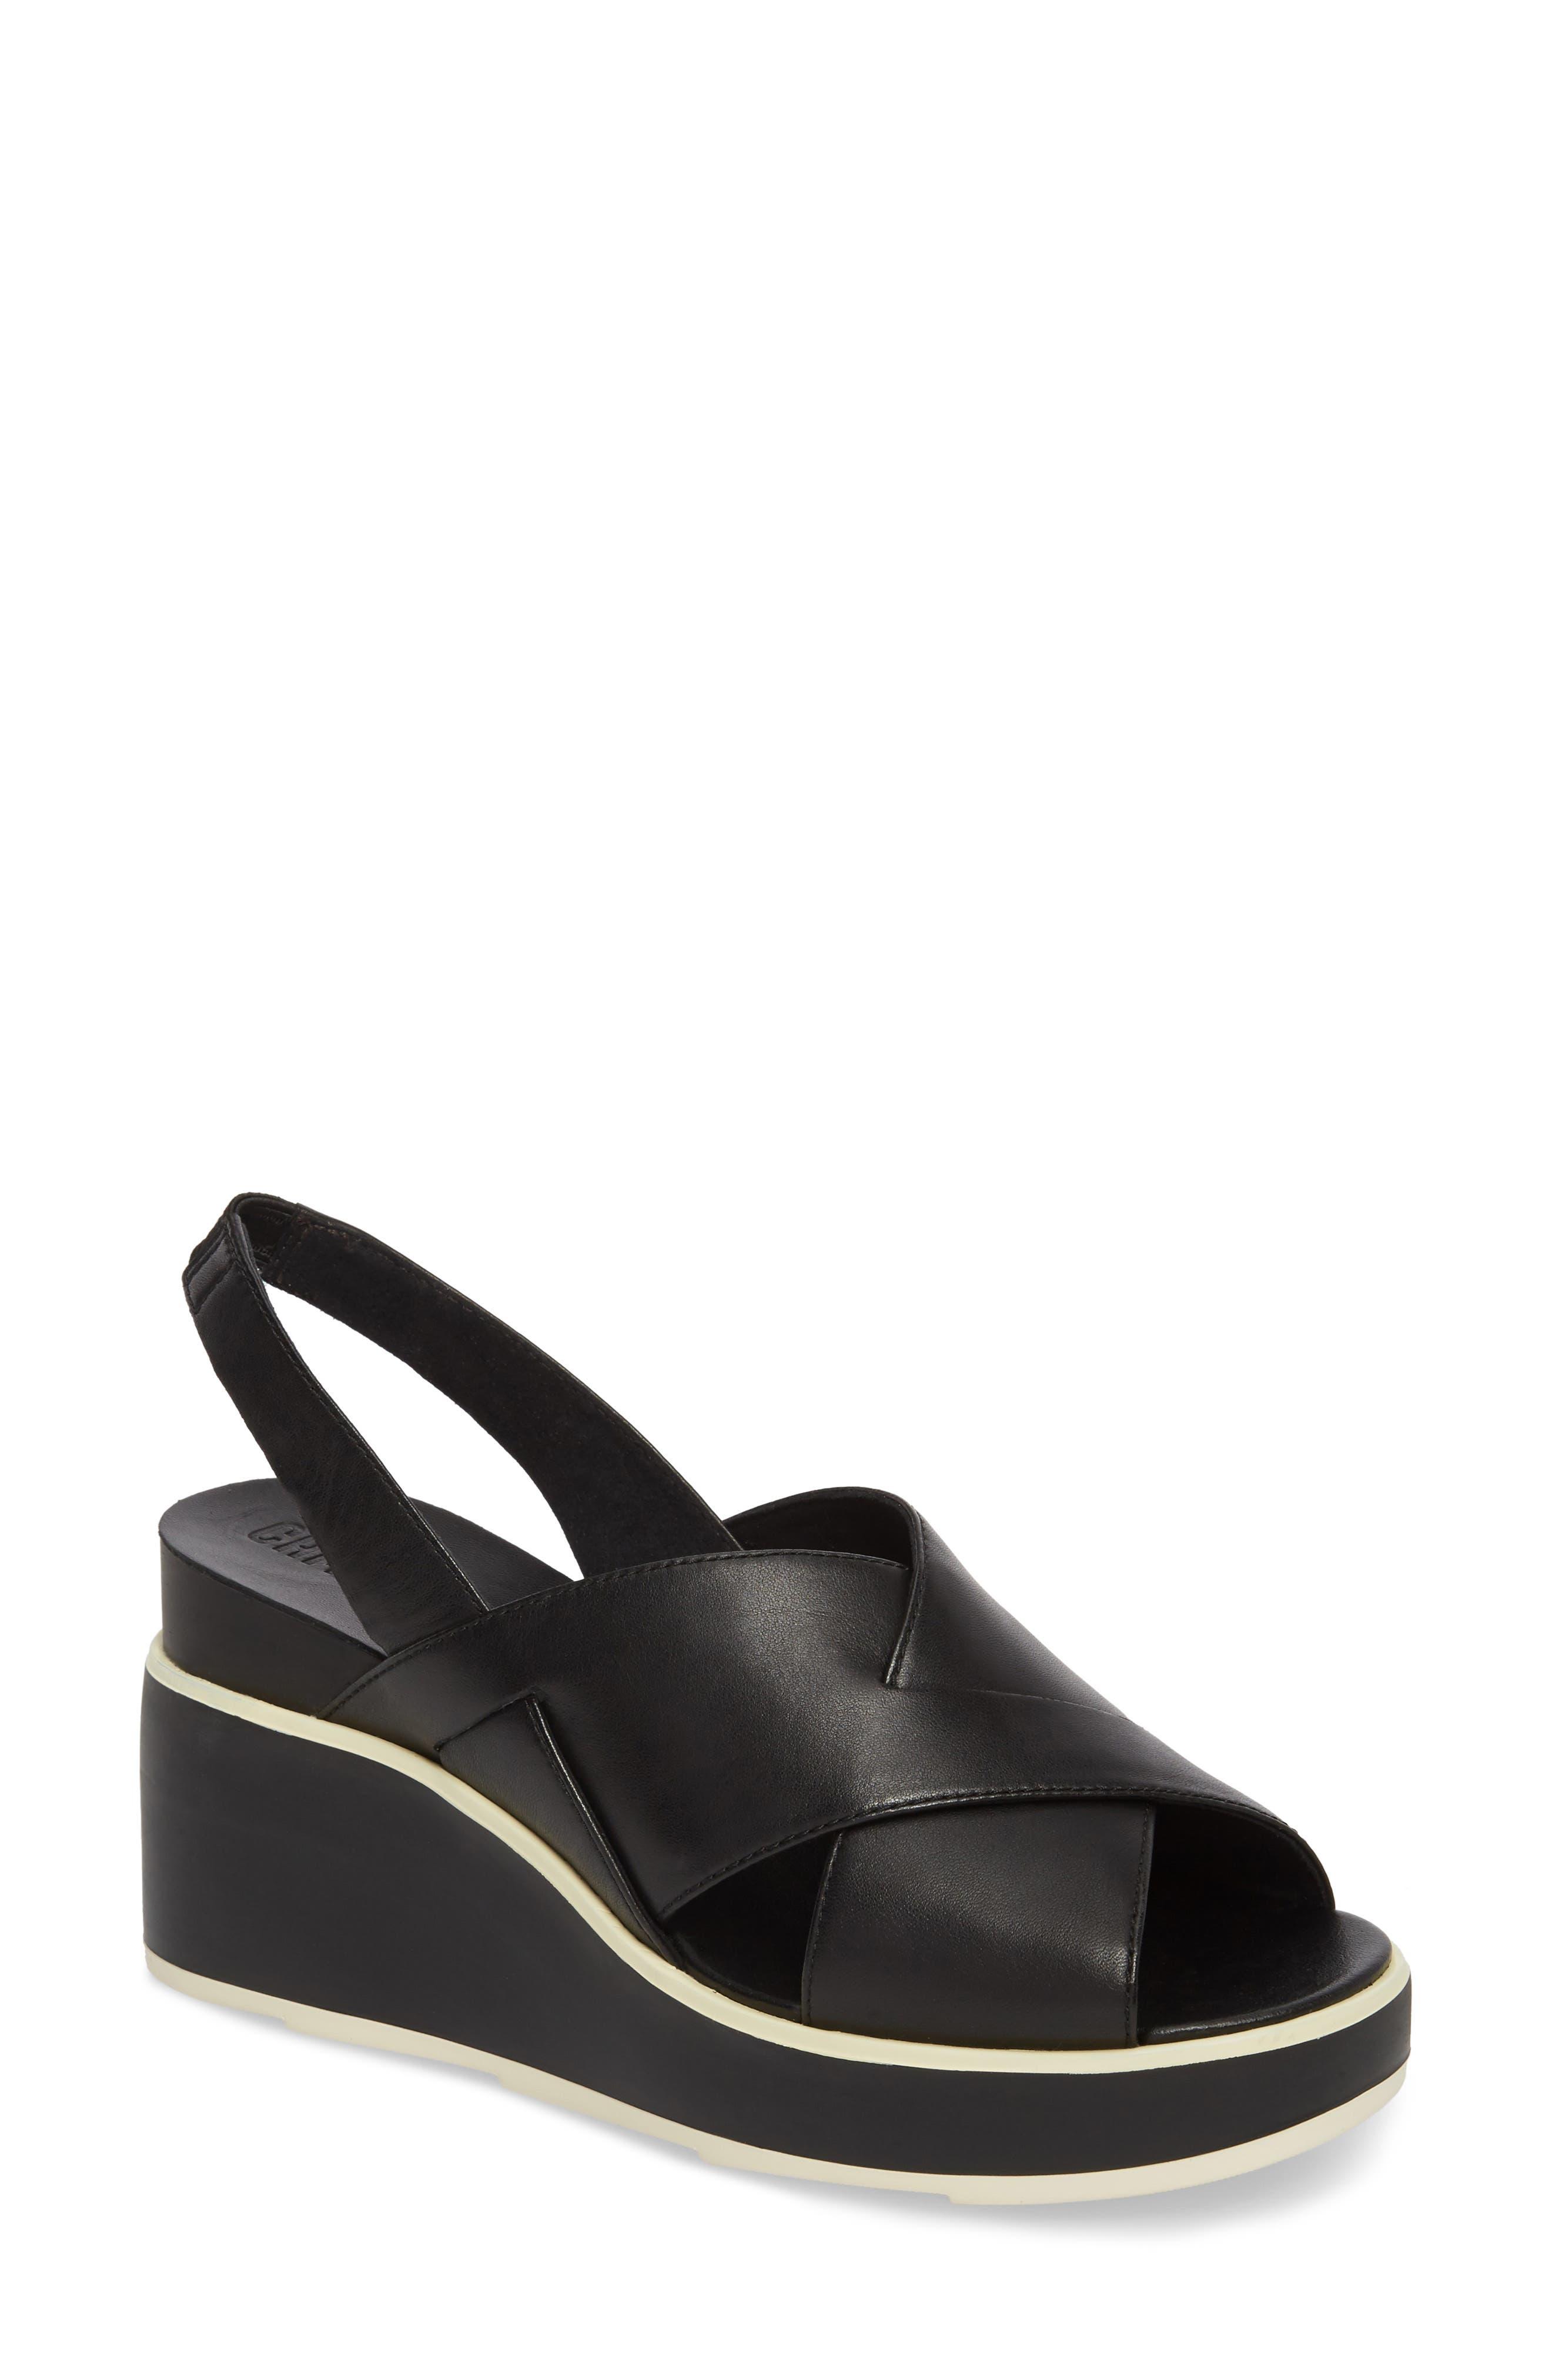 Tropik Cross Strap Wedge Sandal,                         Main,                         color, BLACK LEATHER